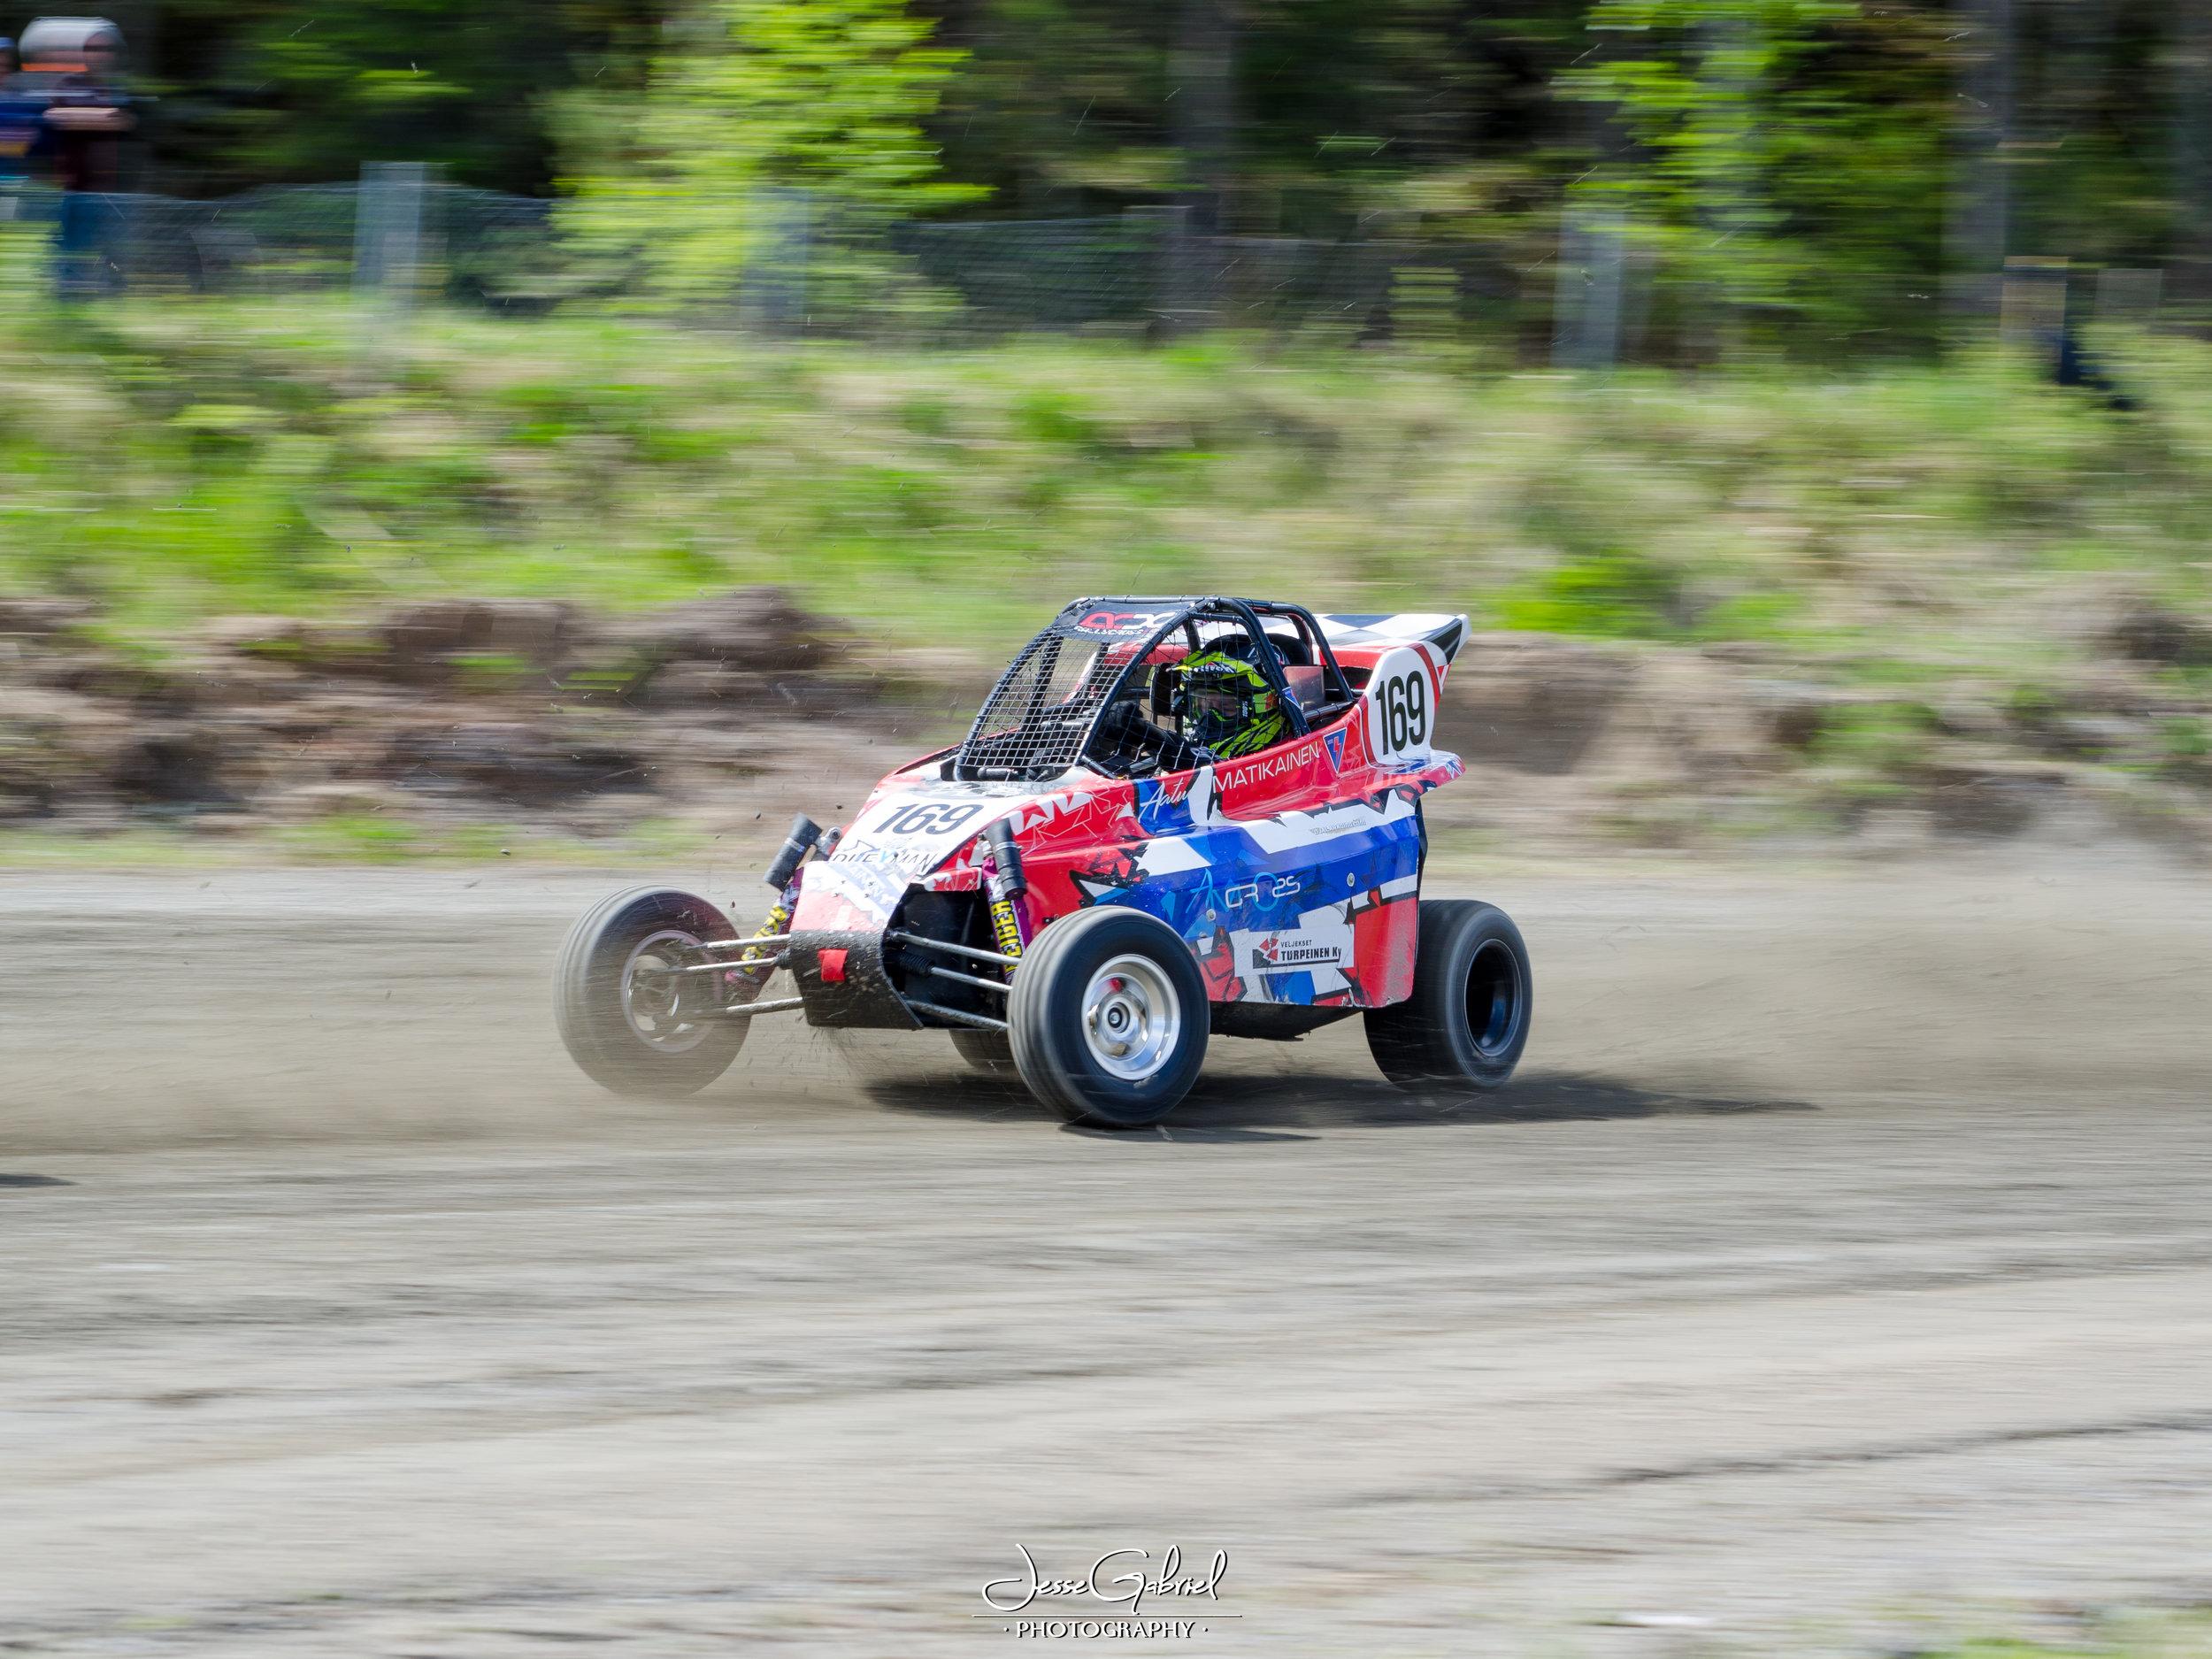 #169 Aatu Matikainen - Seura: KonnMK/UAAuto: IC R4 / KTM